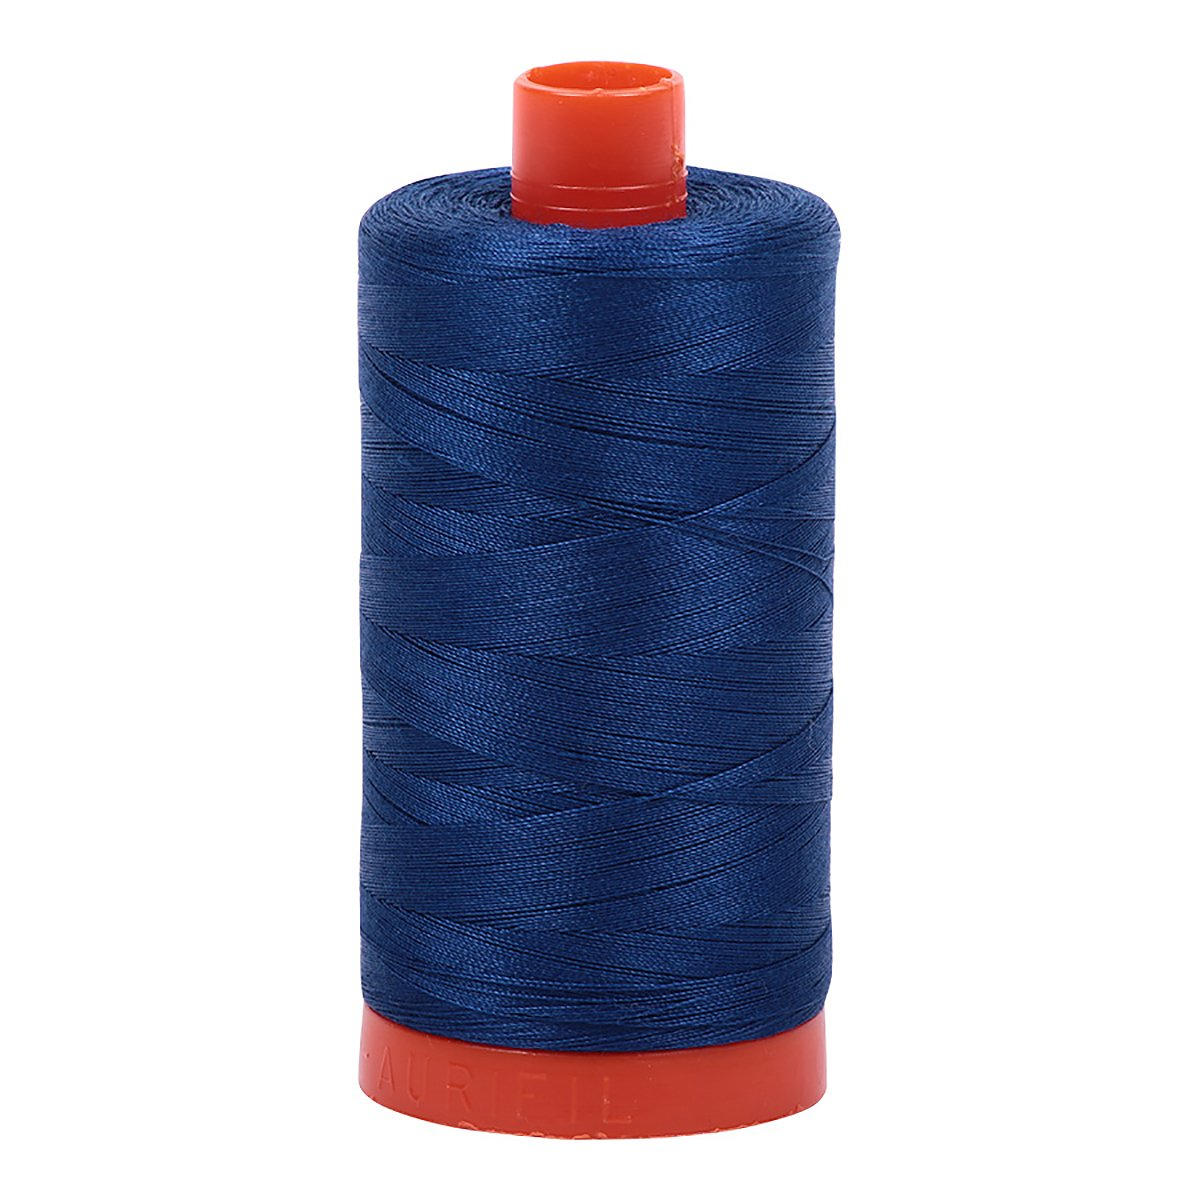 Aurifil Mako Cotton Thread Solid 50wt 1422yds Medium Teal